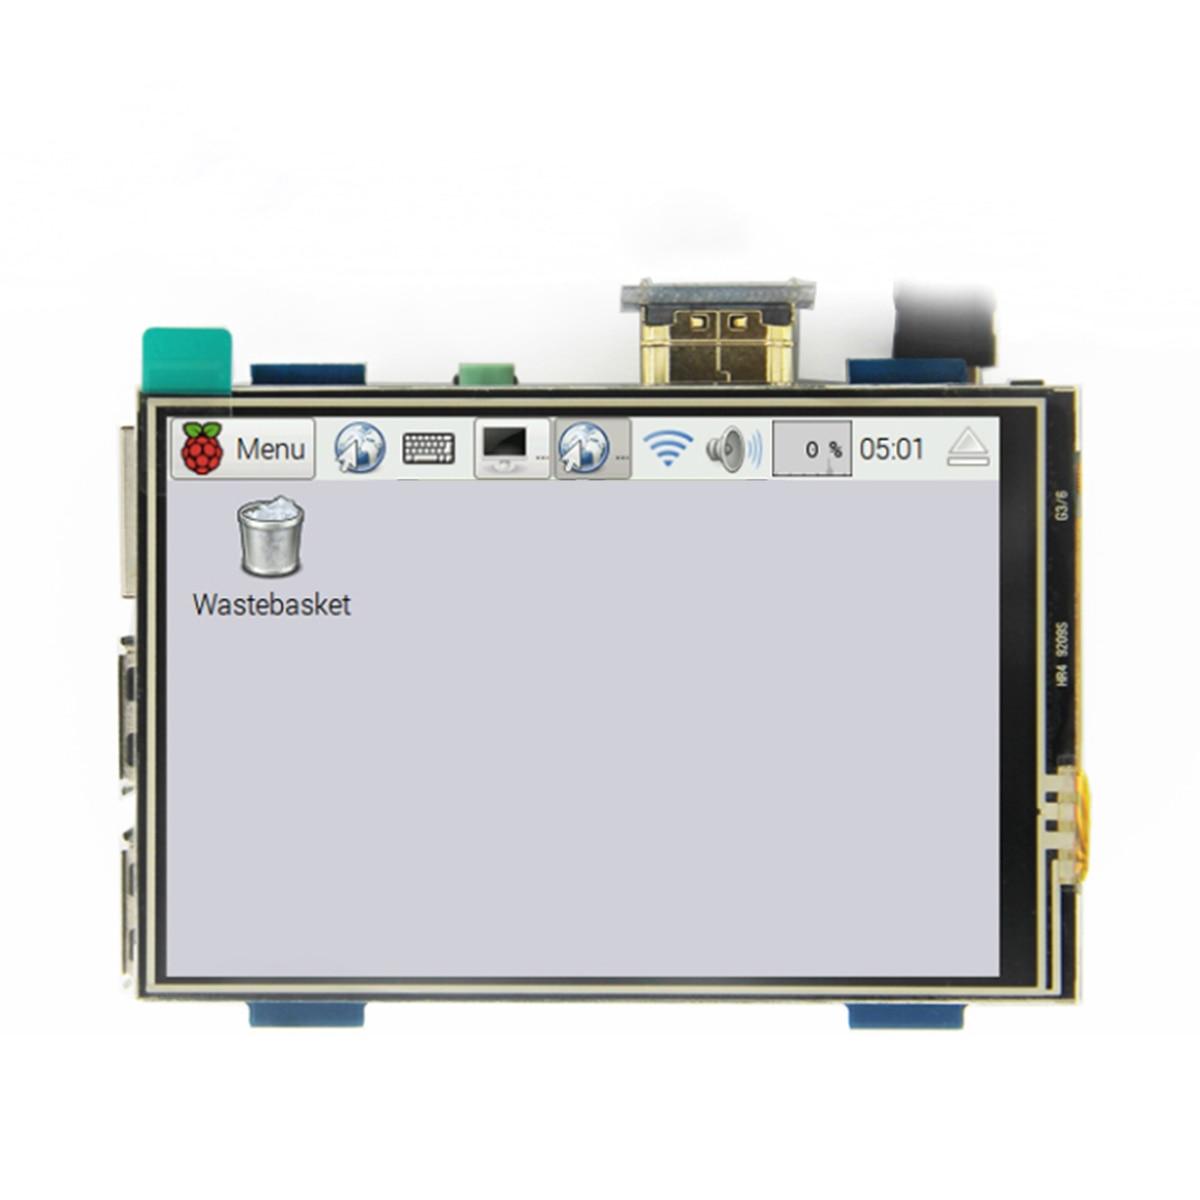 hot-3.5 inch LCD HDMI USB Touch Screen Real HD 1920x1080 LCD Display for Raspberri 3 Model B / Orange Pi (Play Game Video)MPI3